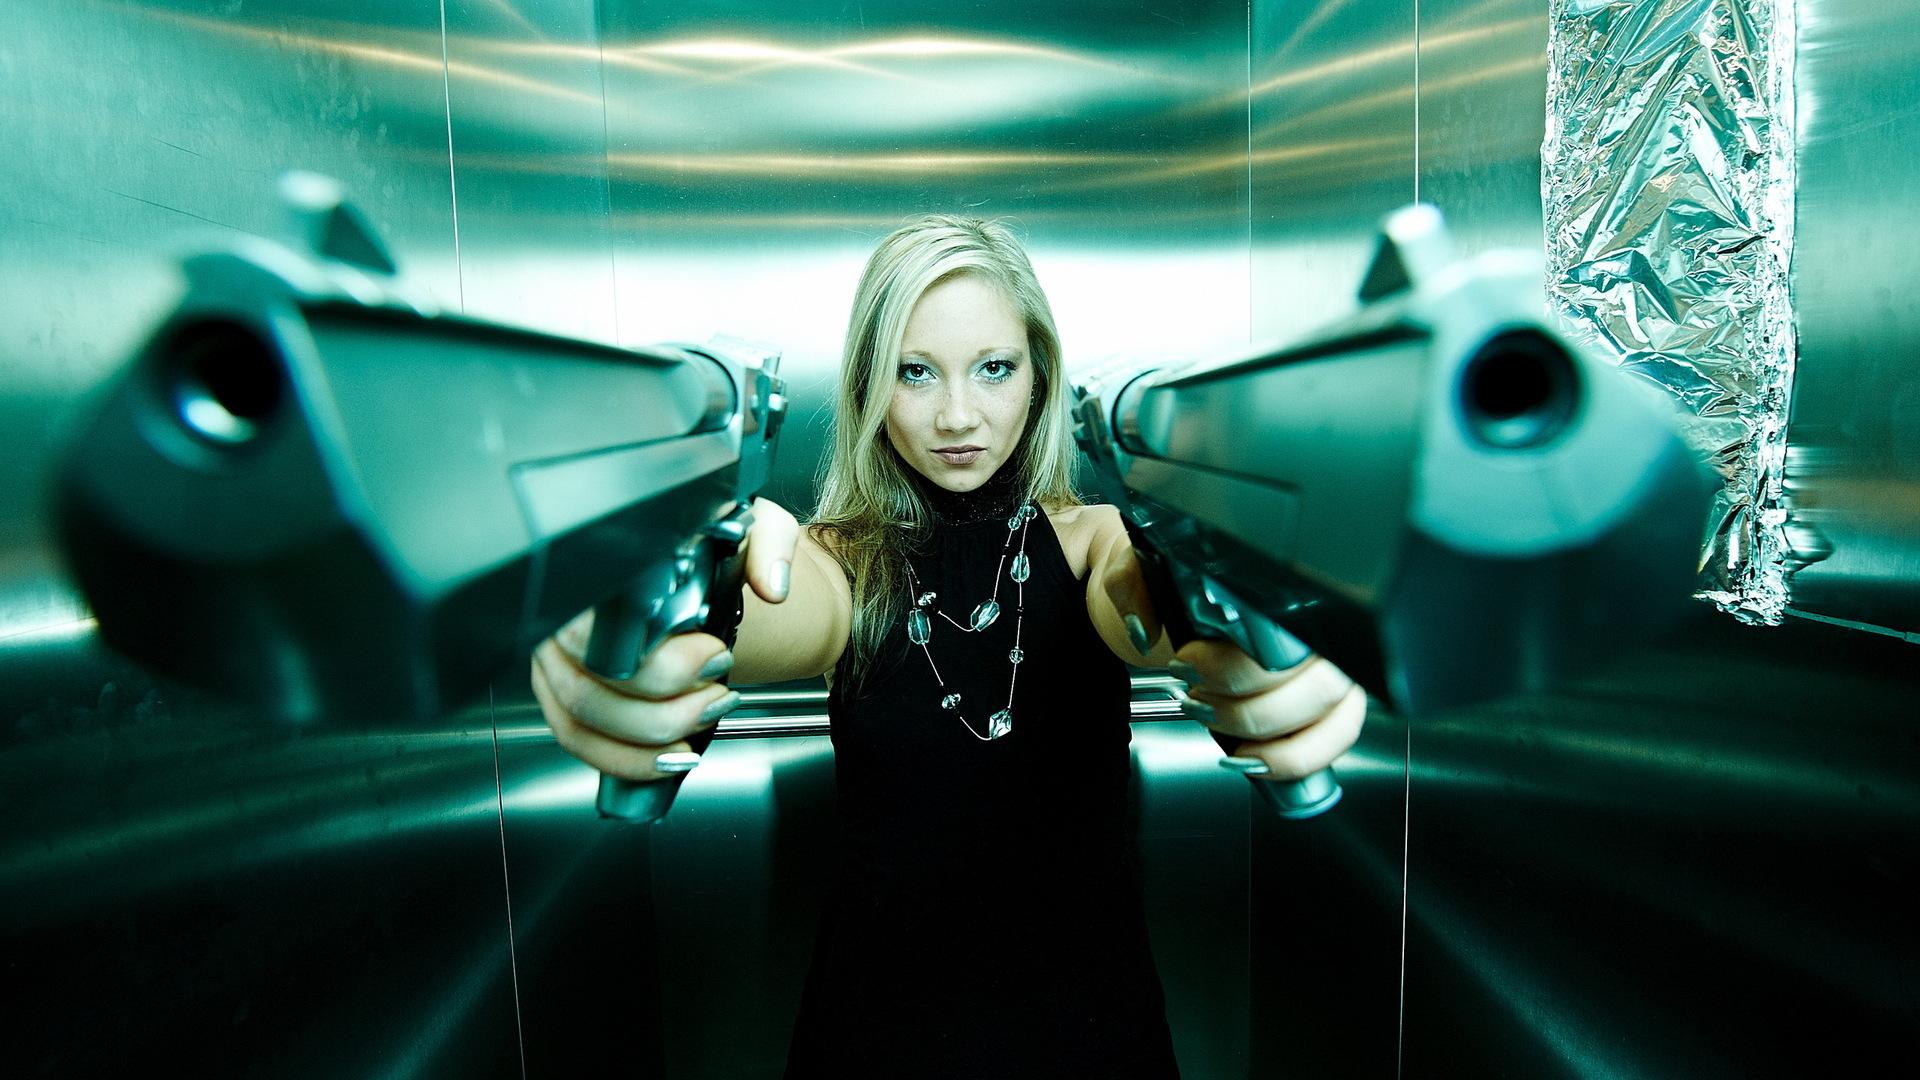 Copia di girl with guns widescreen high quality wallpaper